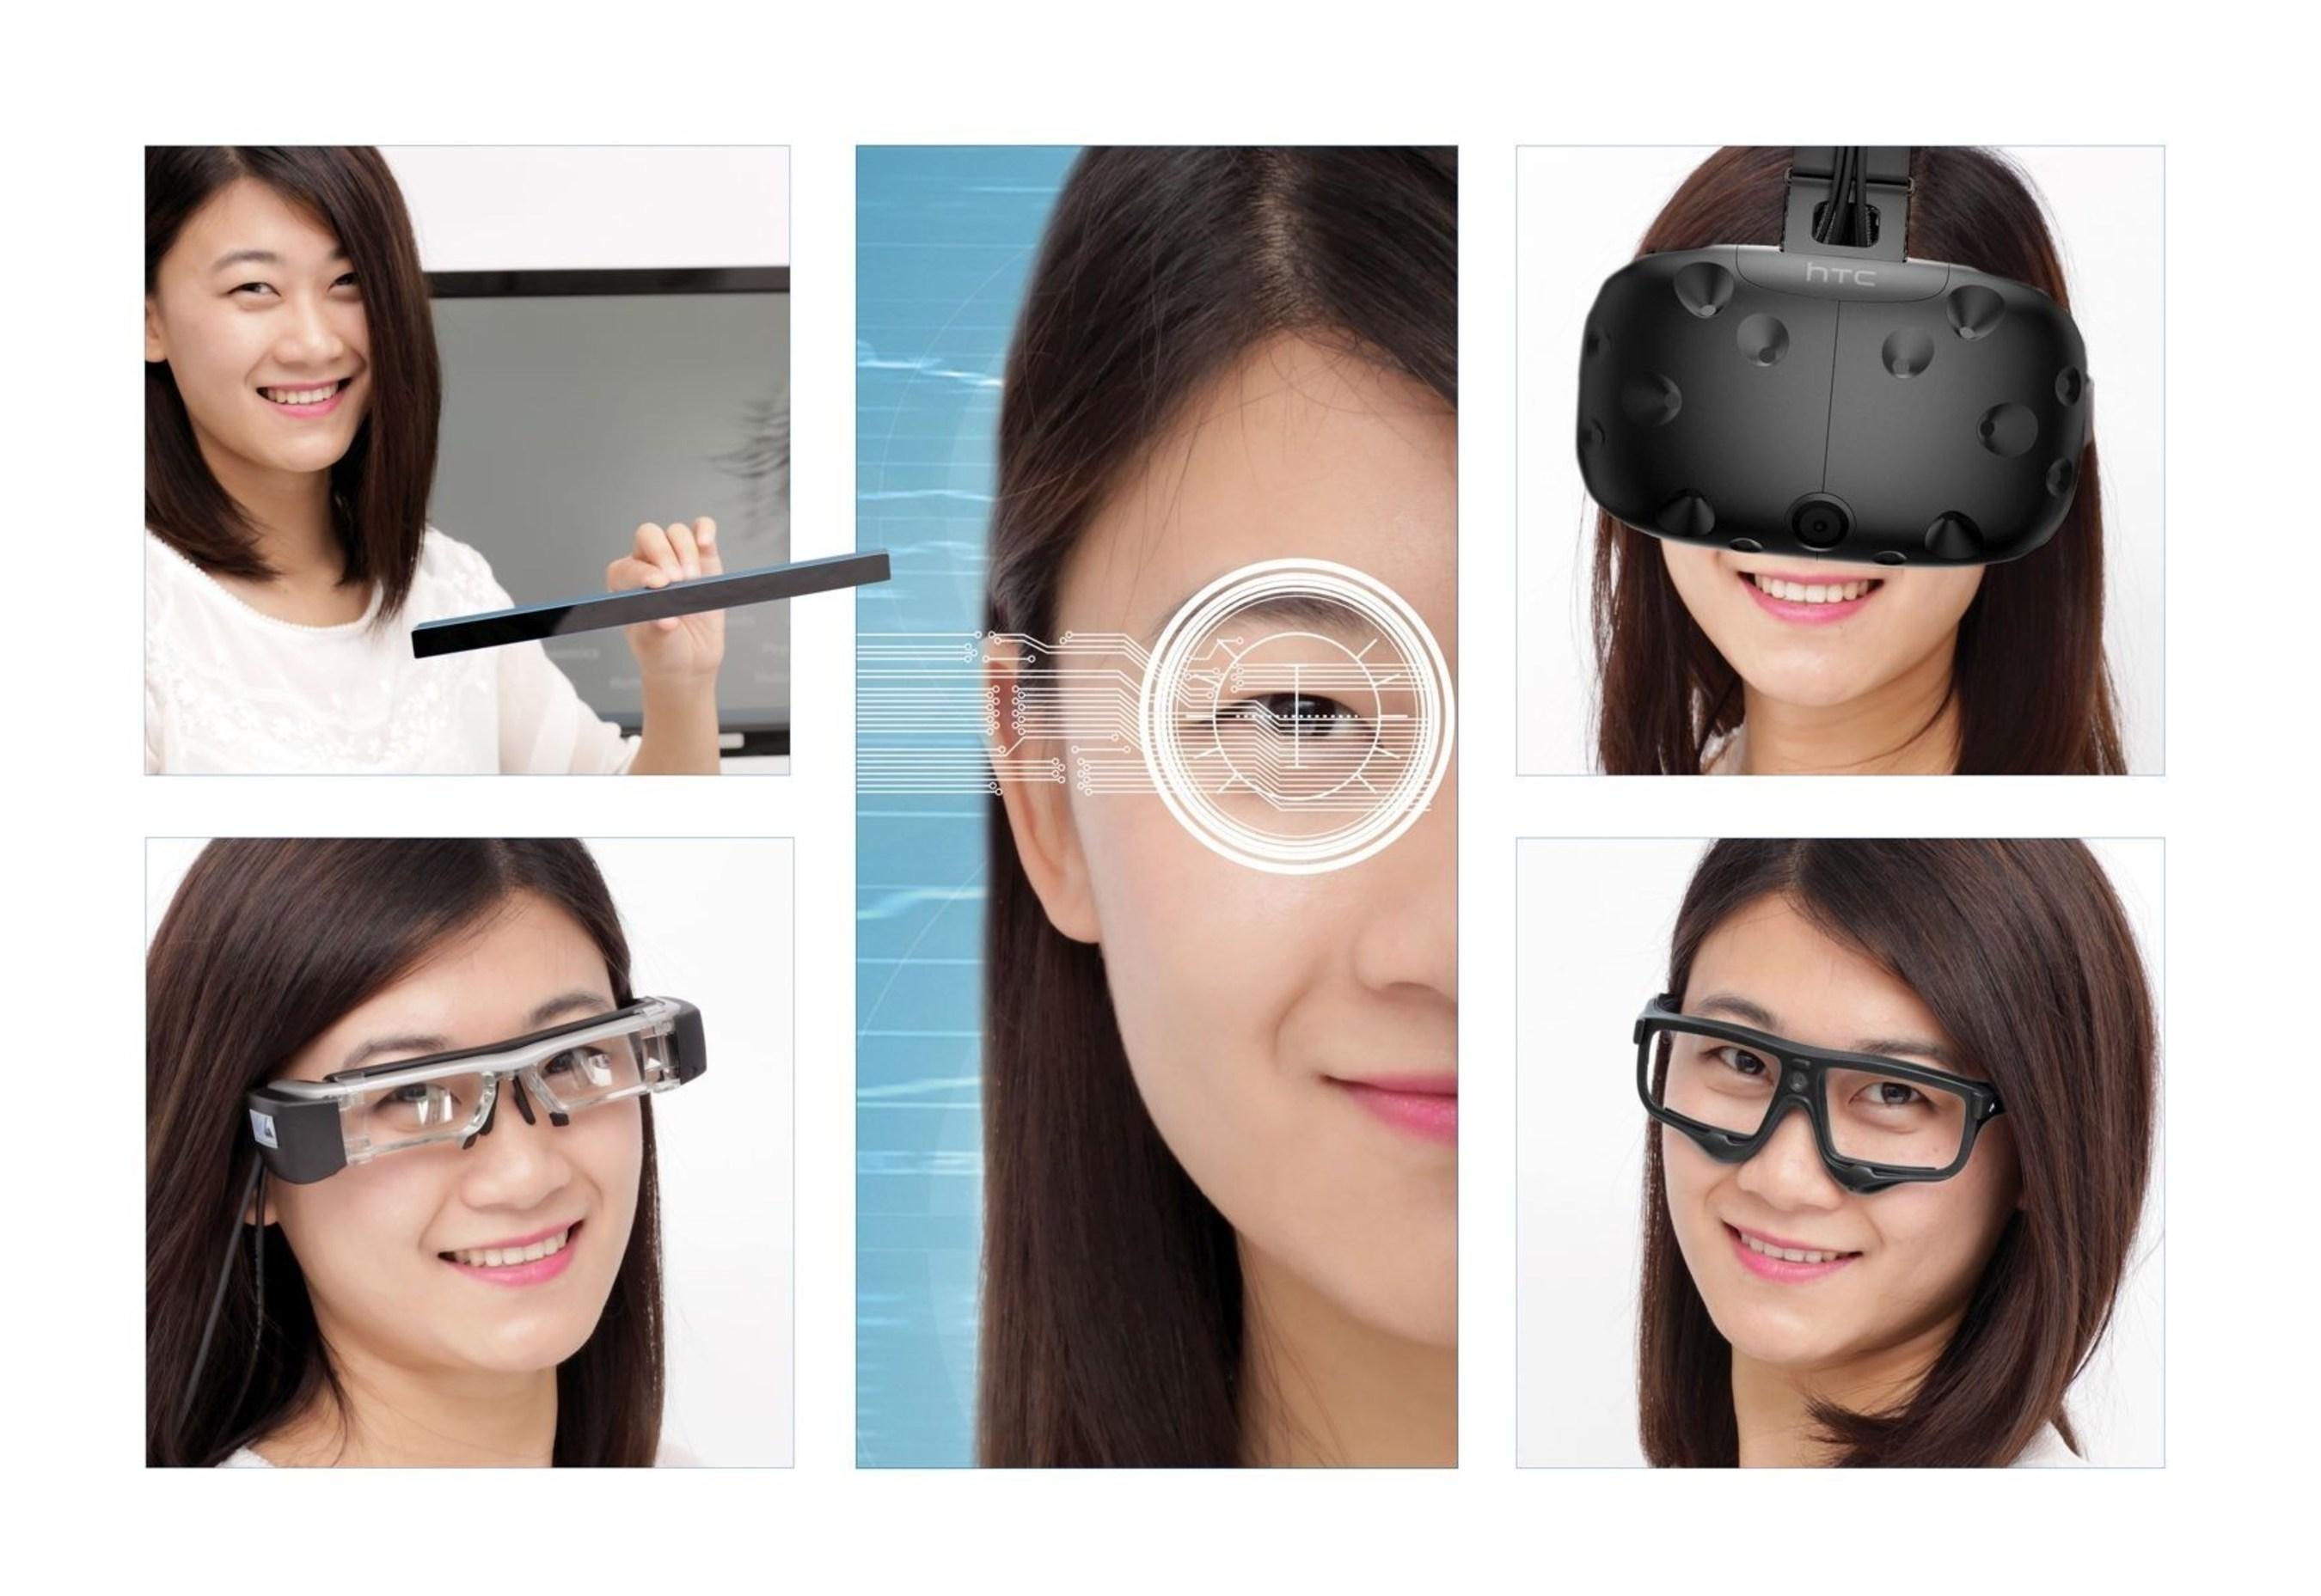 SMI Expands OEM Platform with Eye Tracking HTC Vive Developer Kit (PRNewsFoto/SensoMotoric Instruments GmbH)